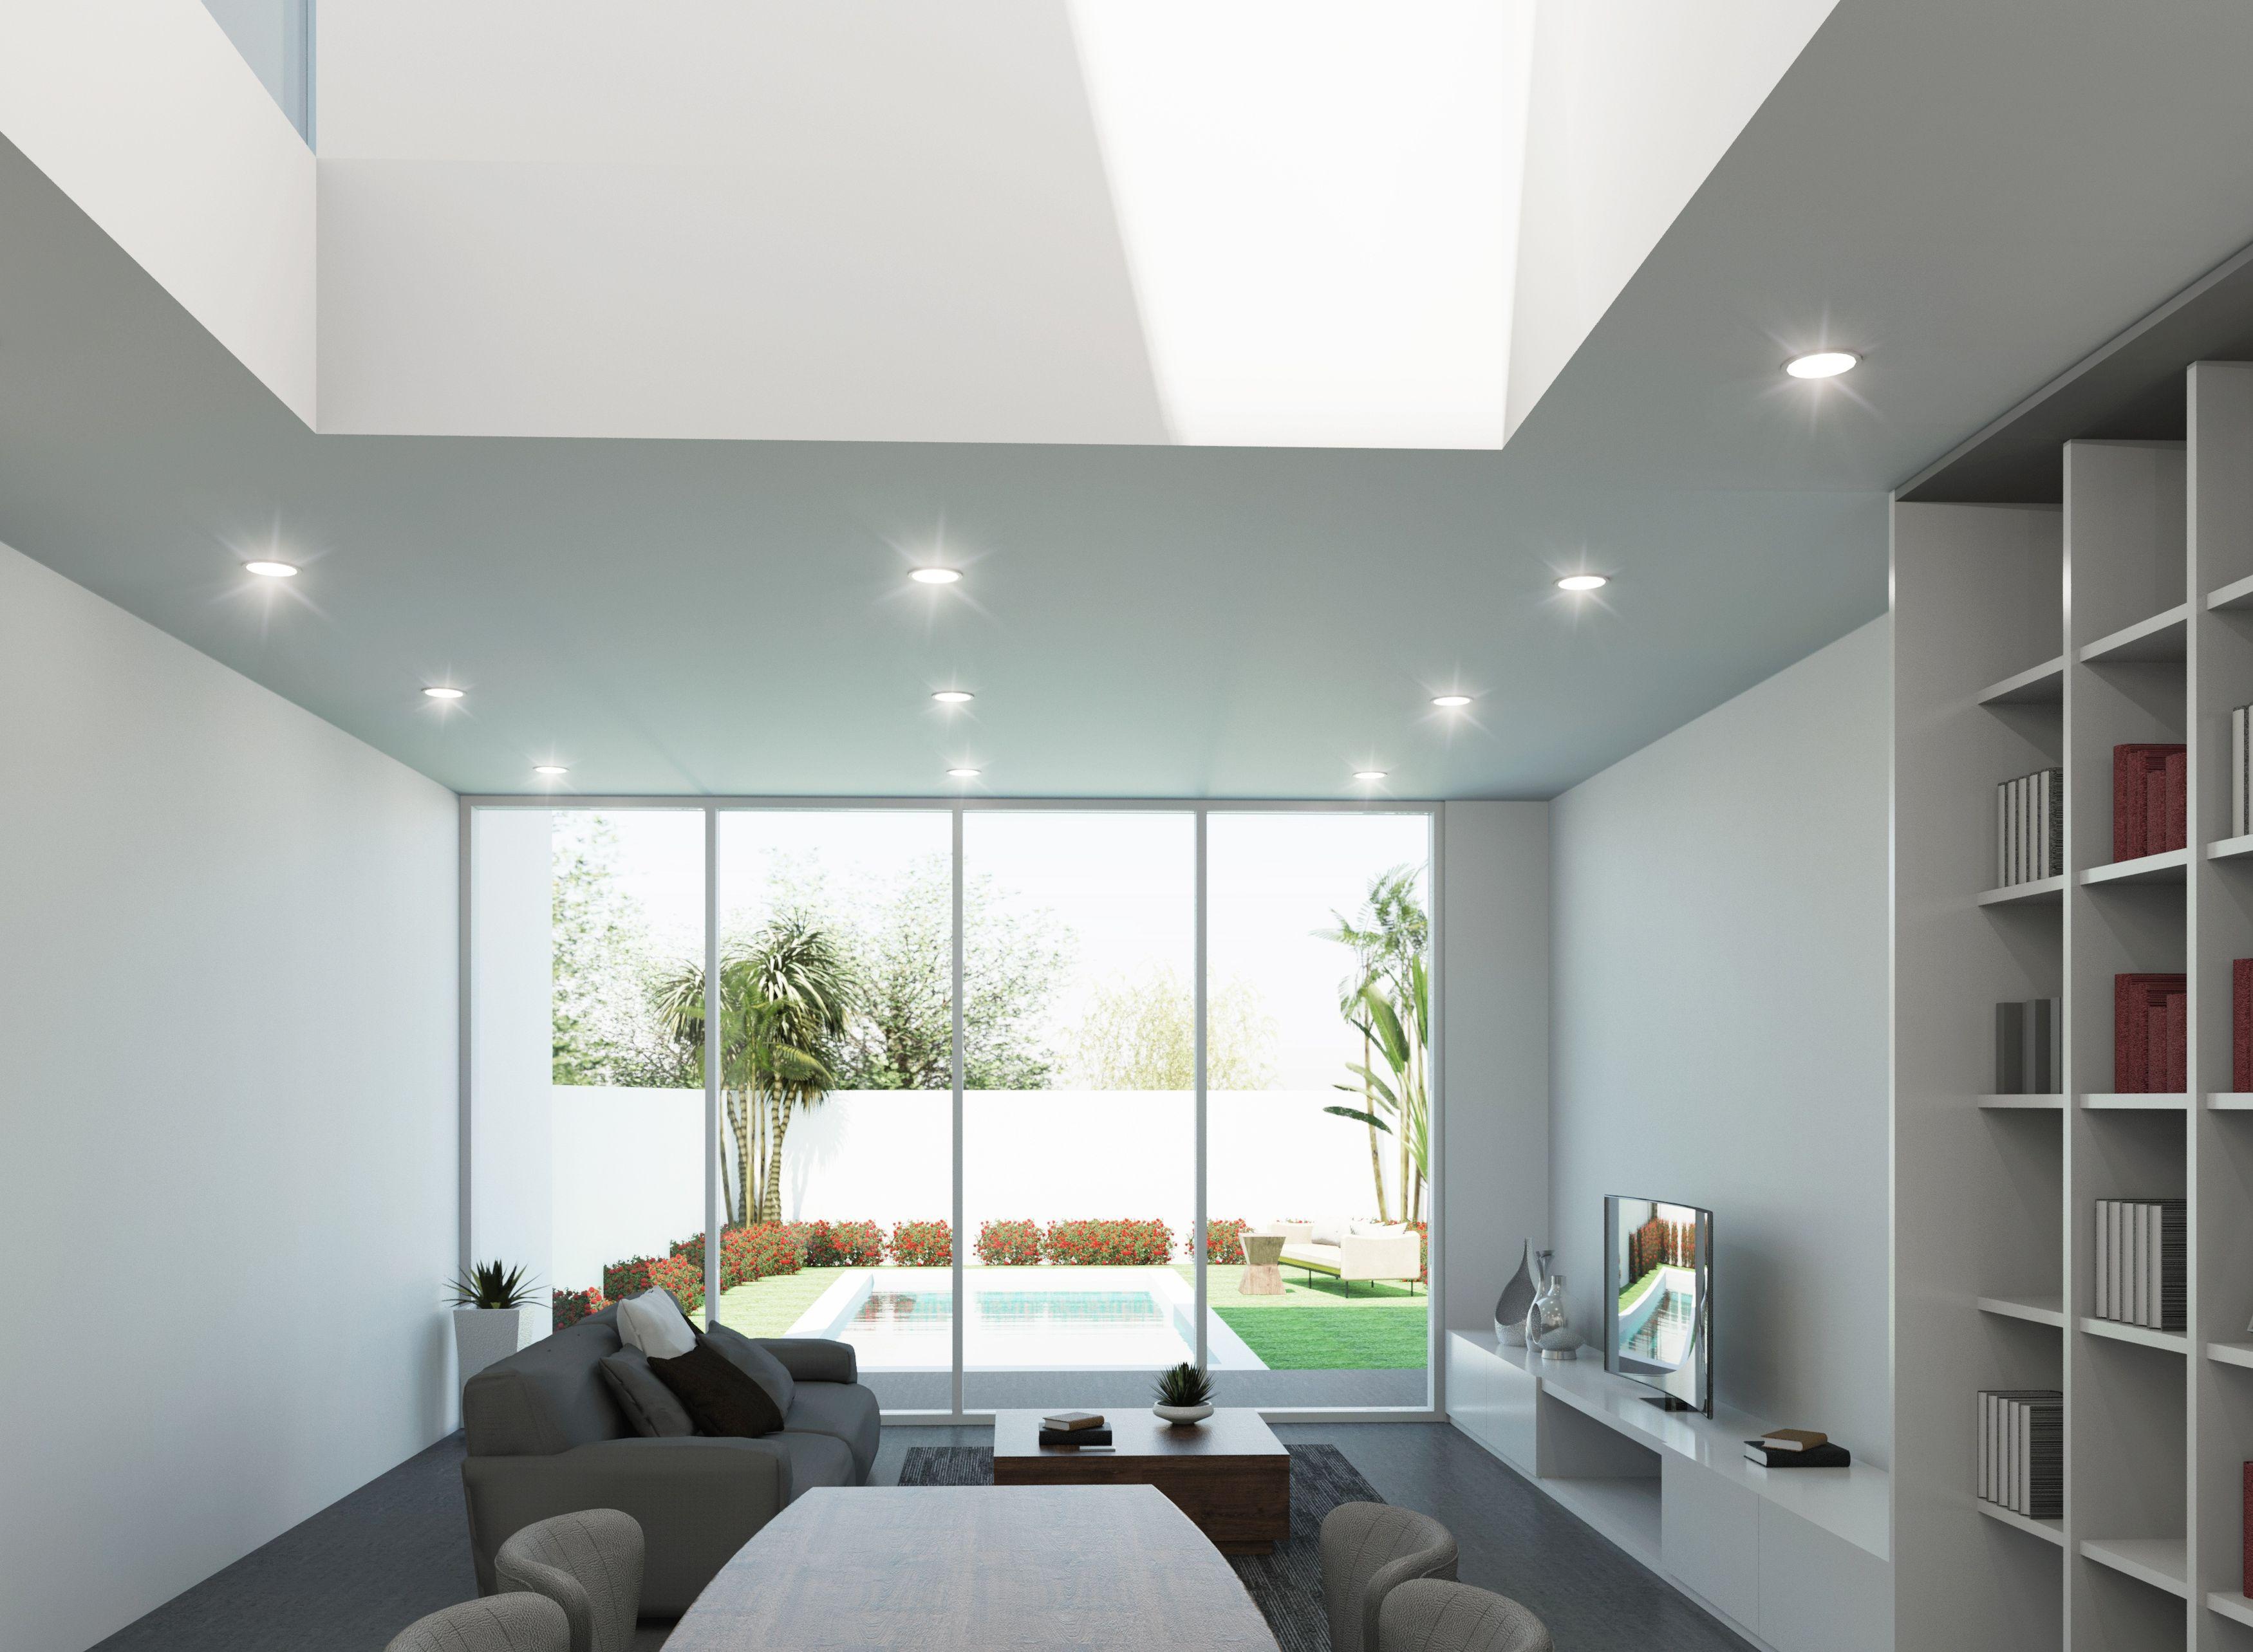 Living Room Concept đa Nẵng Autodesk Online Gallery